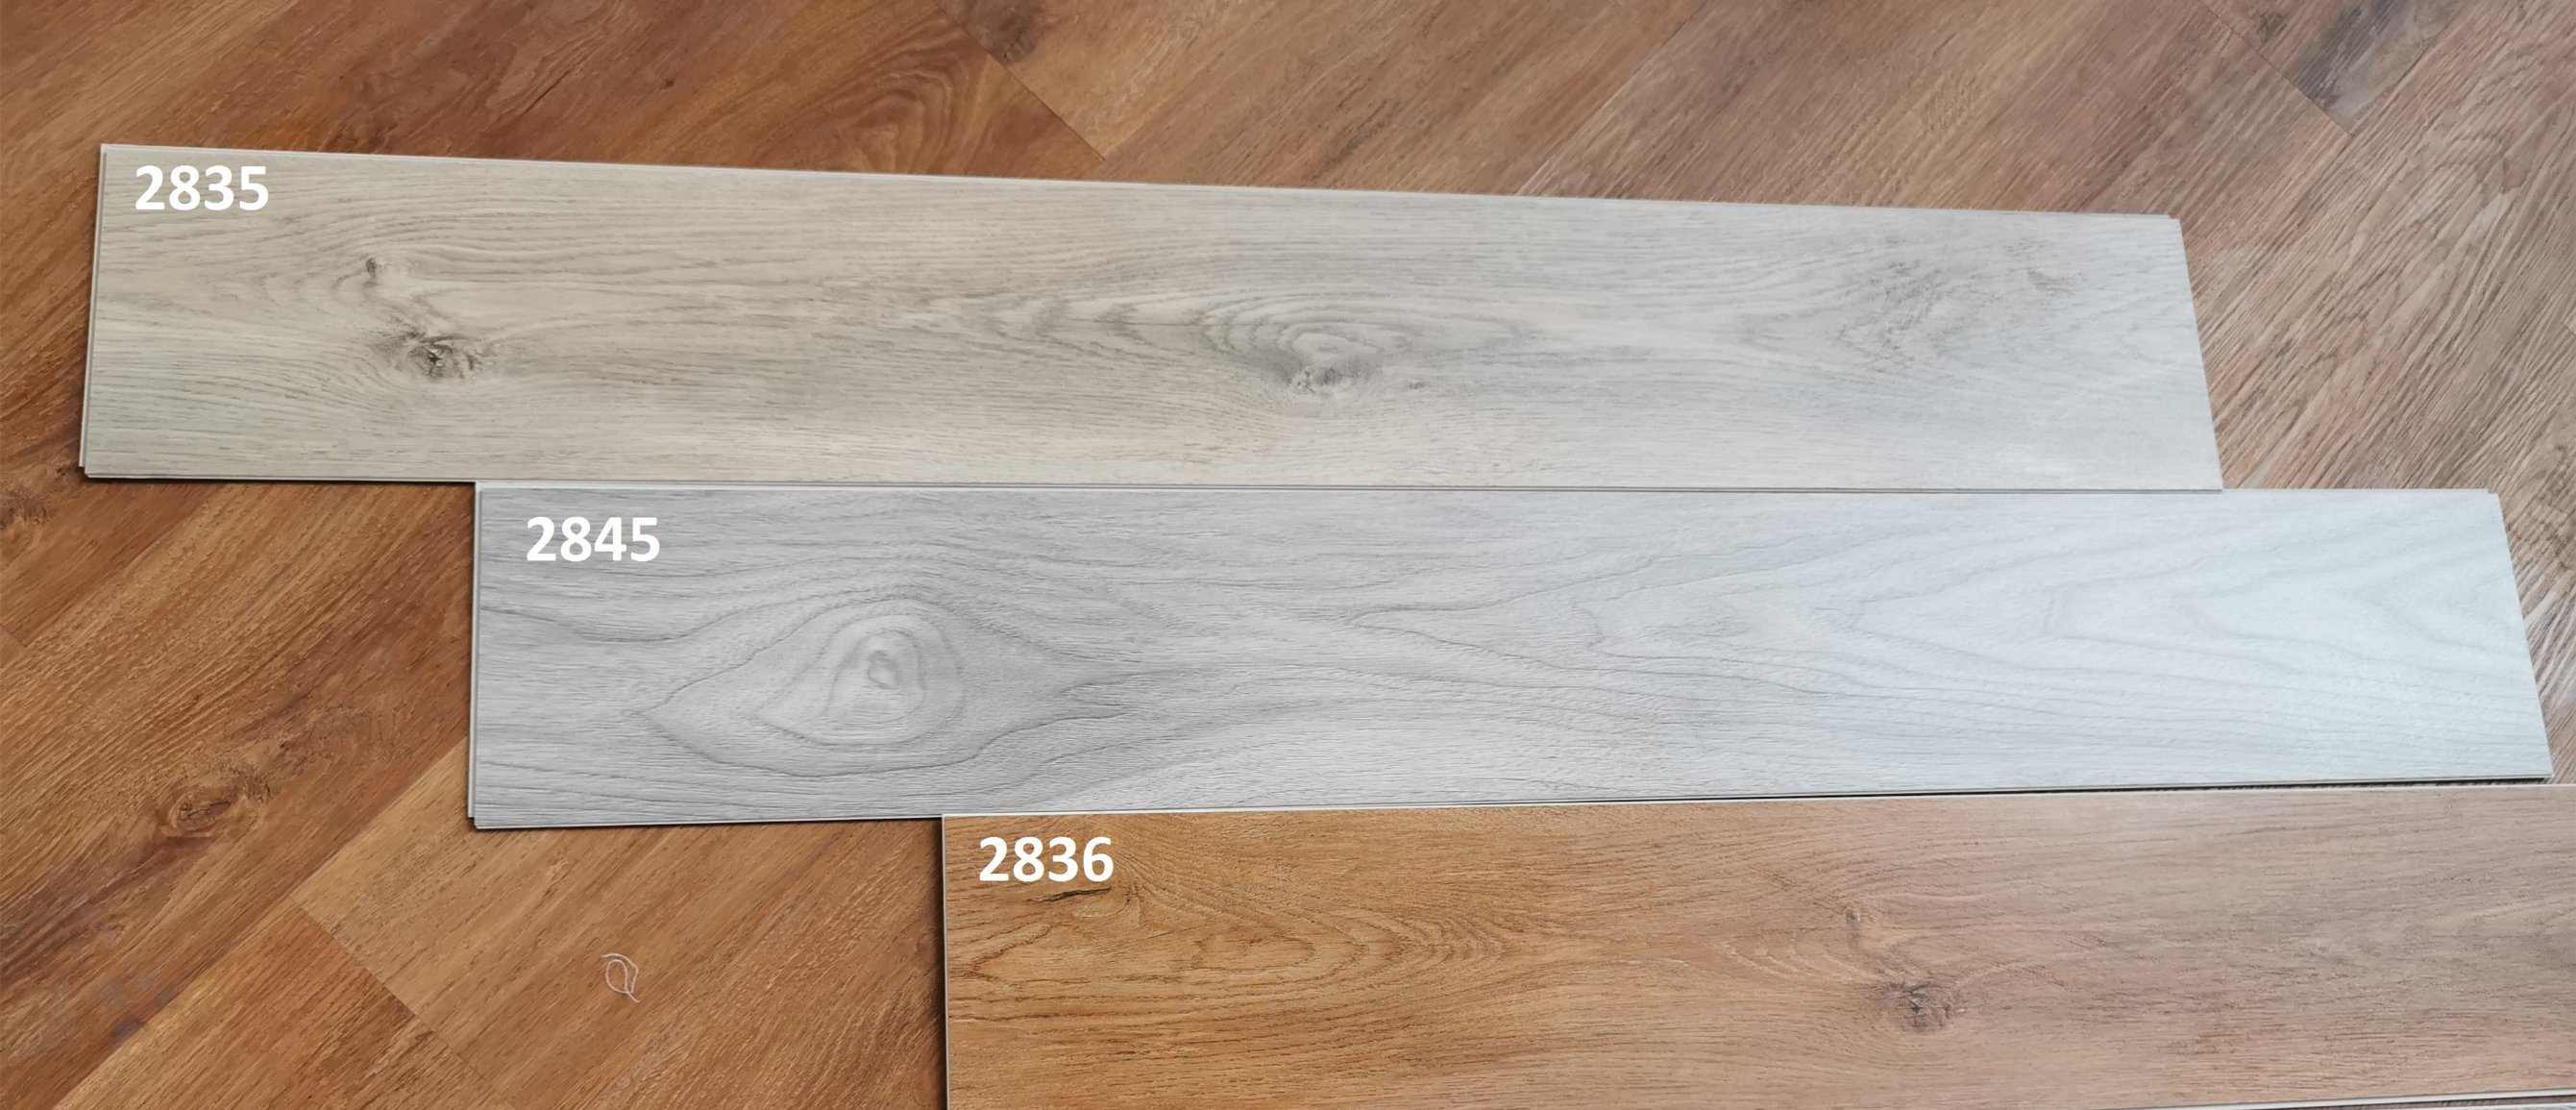 China Spc Vinyl Flooring Waterproof, Unilin Laminate Flooring Reviews